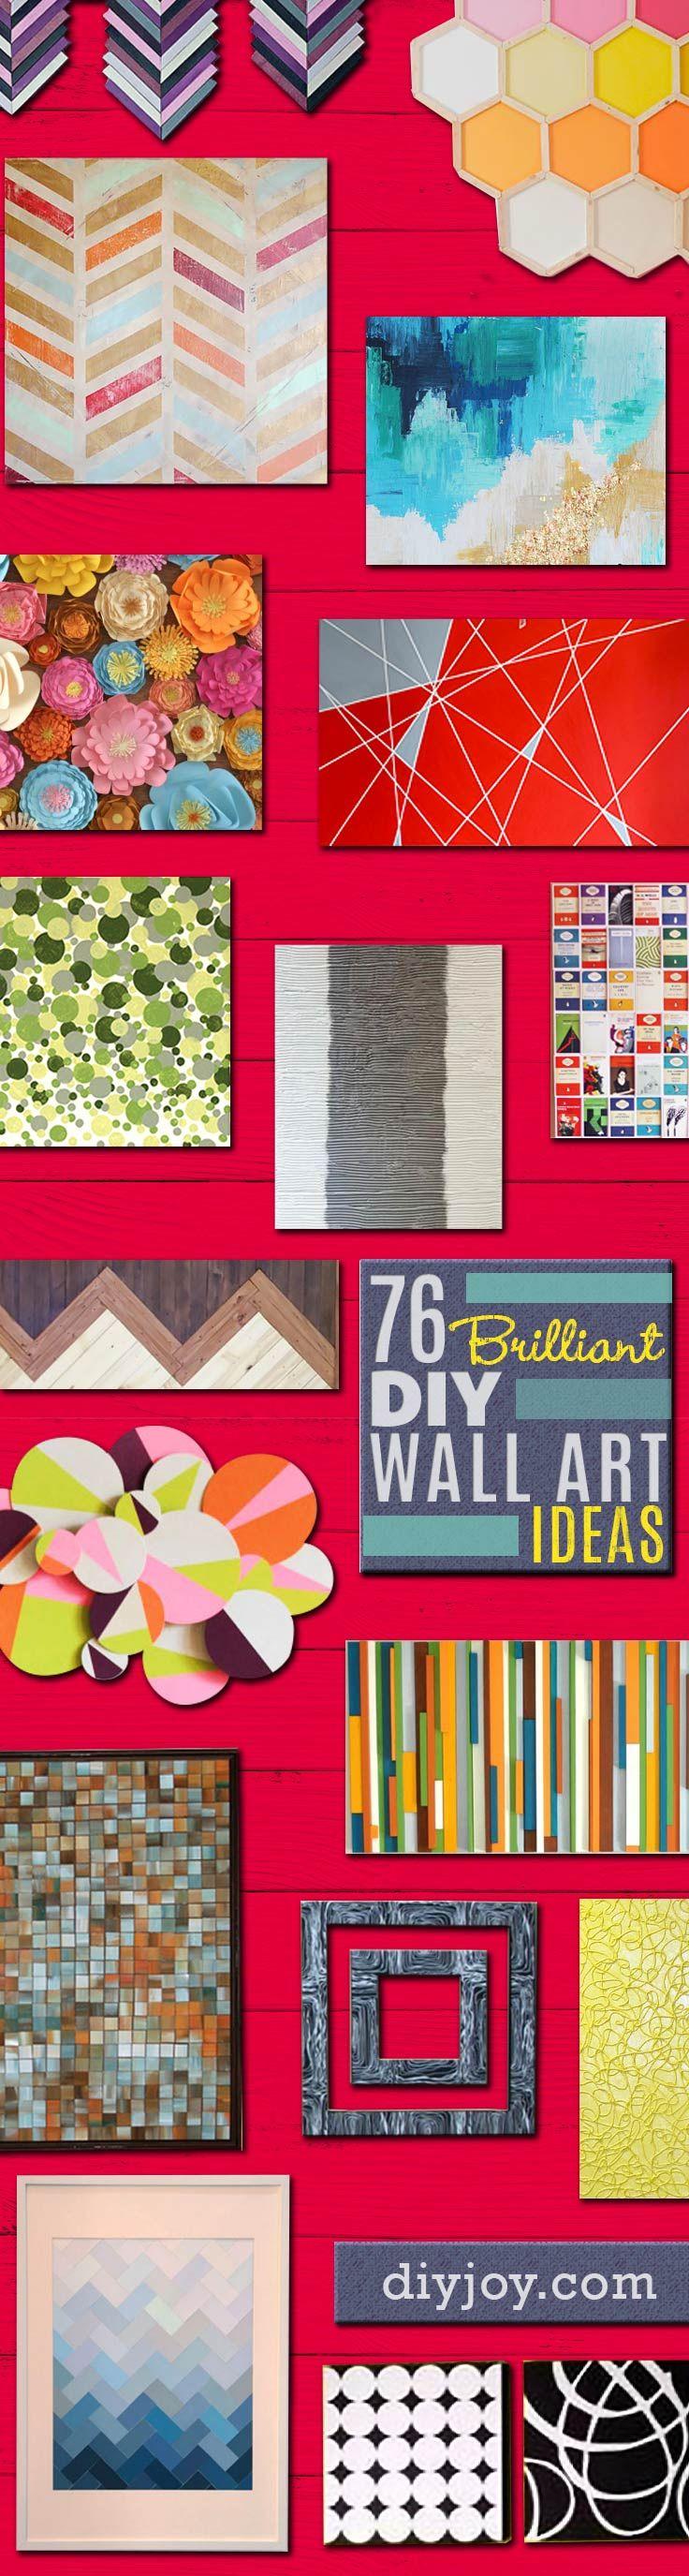 76 Brilliant Diy Wall Art Ideas For Your Blank Walls Do